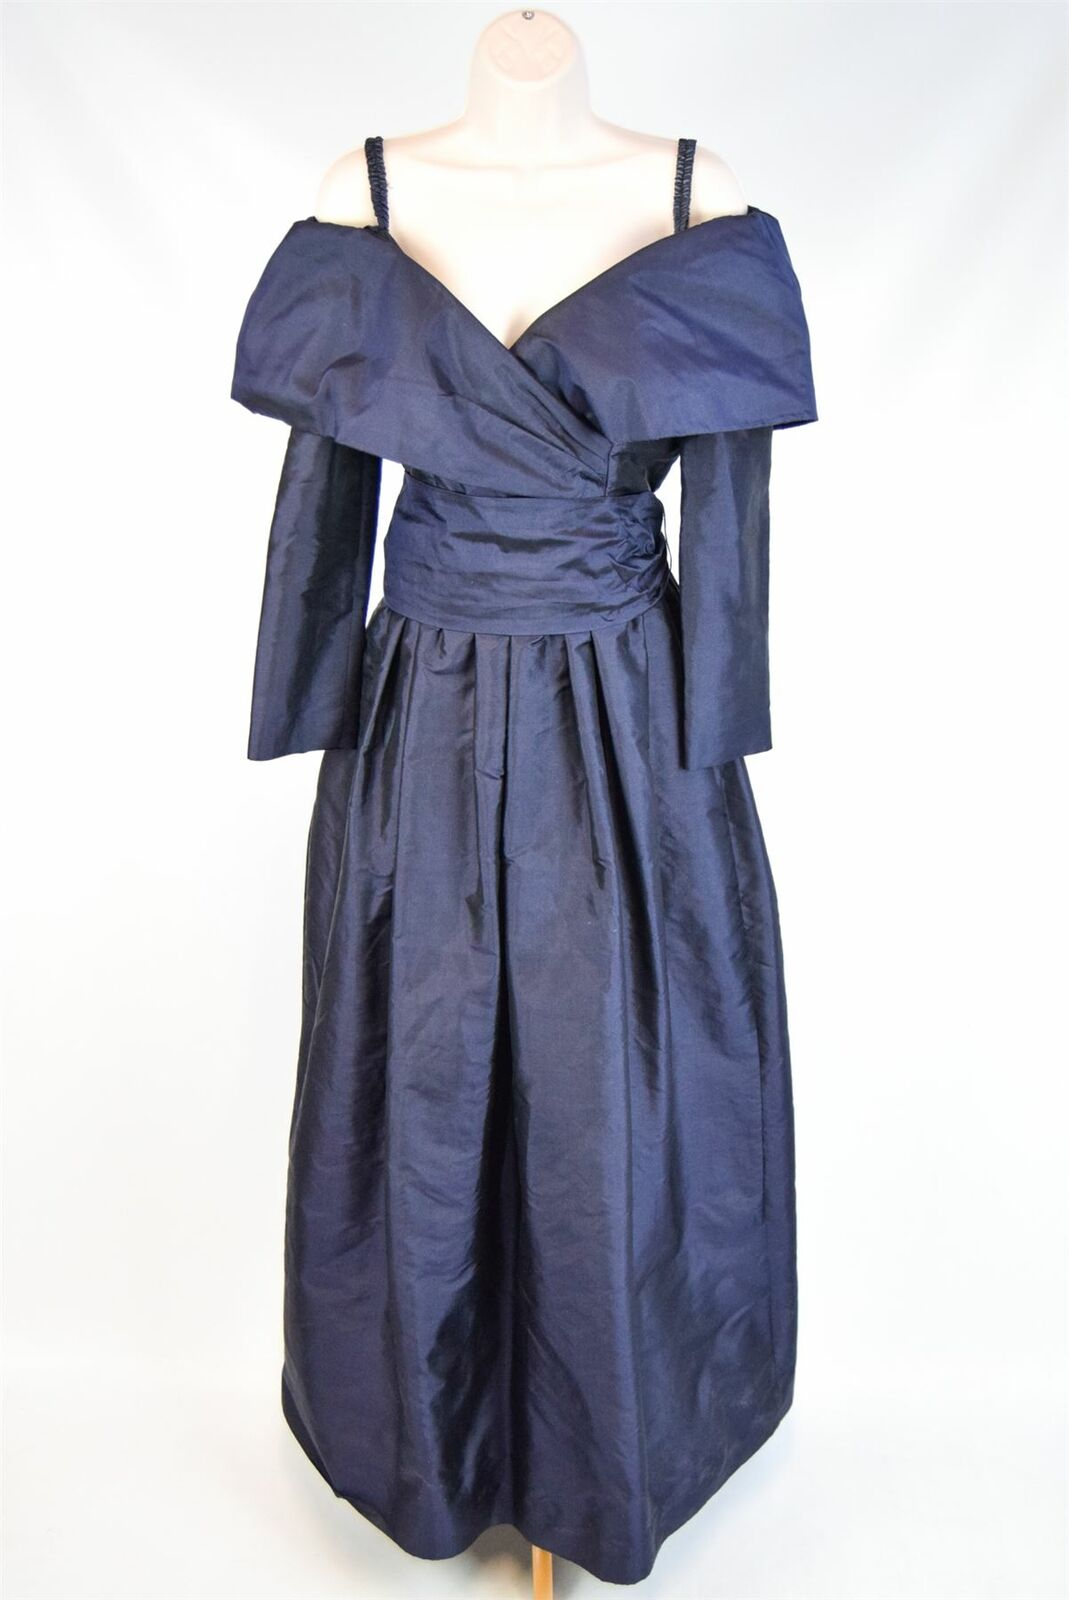 CATHERINE REGEHR Navy bluee 100% Silk Evening Dress, Size S S S 932e13